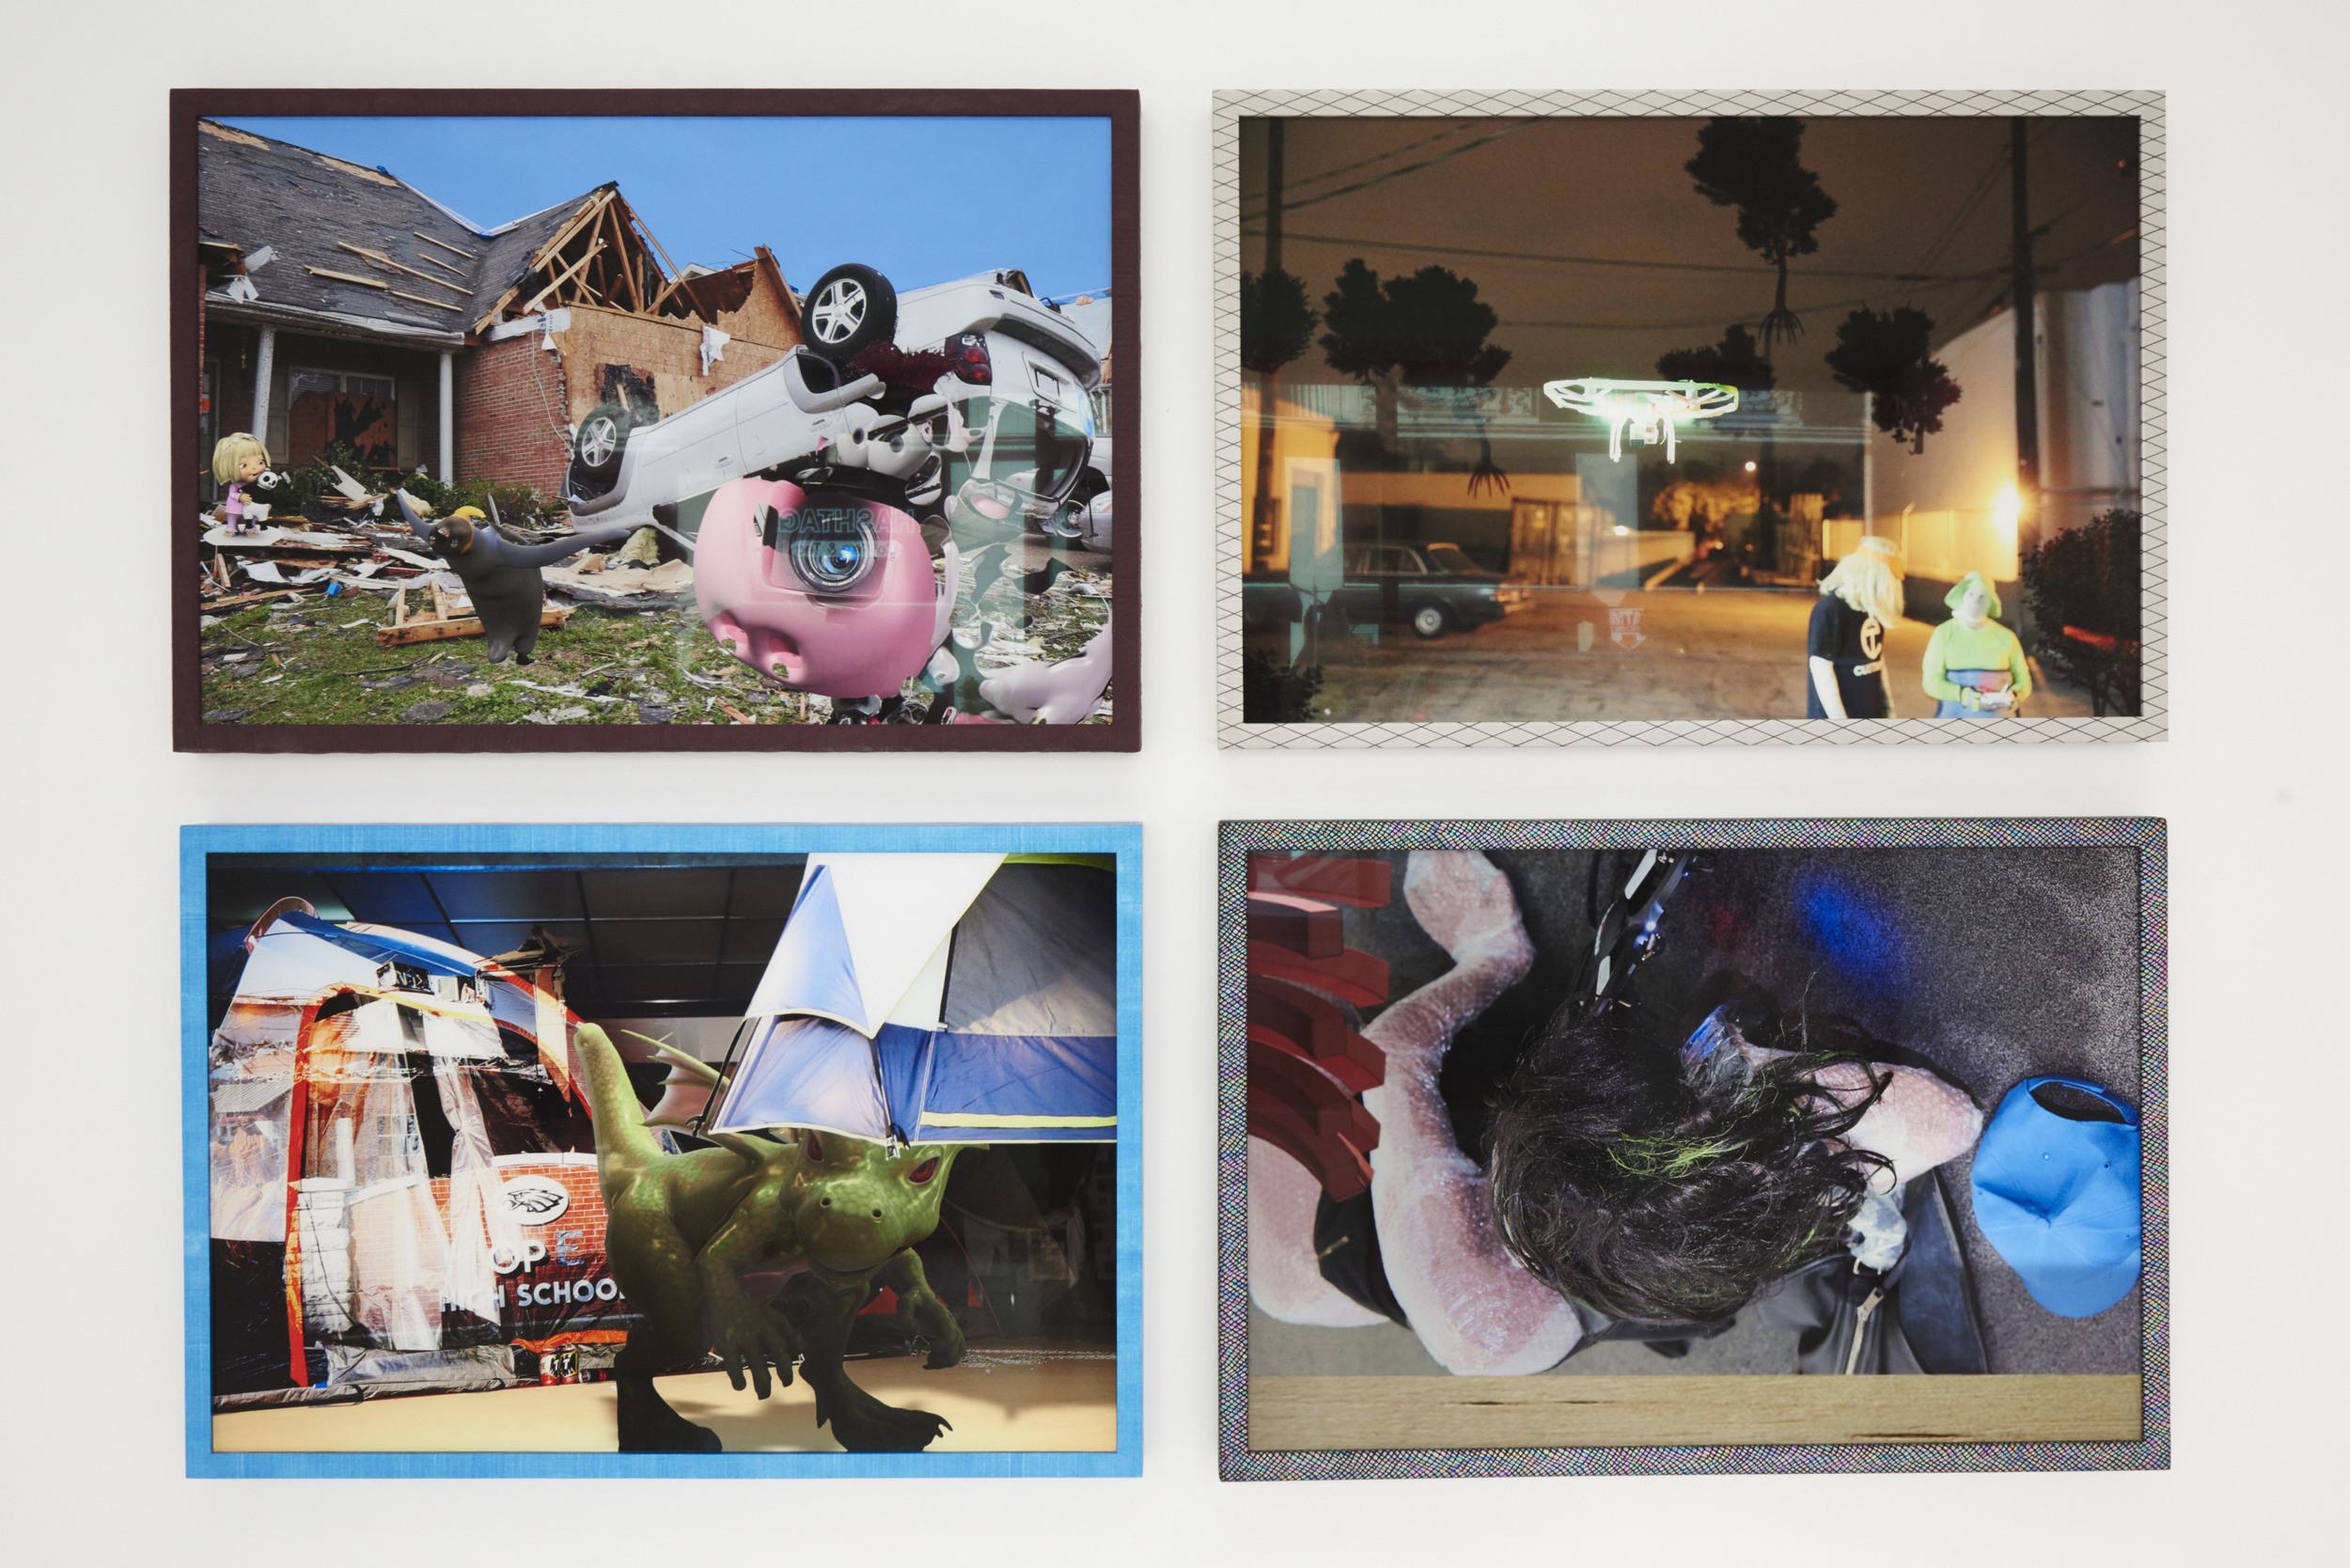 Ryan Trecartin,  Empathy Camp and Refugee Petting Zoo , 2015  Animation Companion   The Pleasure Principle , 2016, installation view